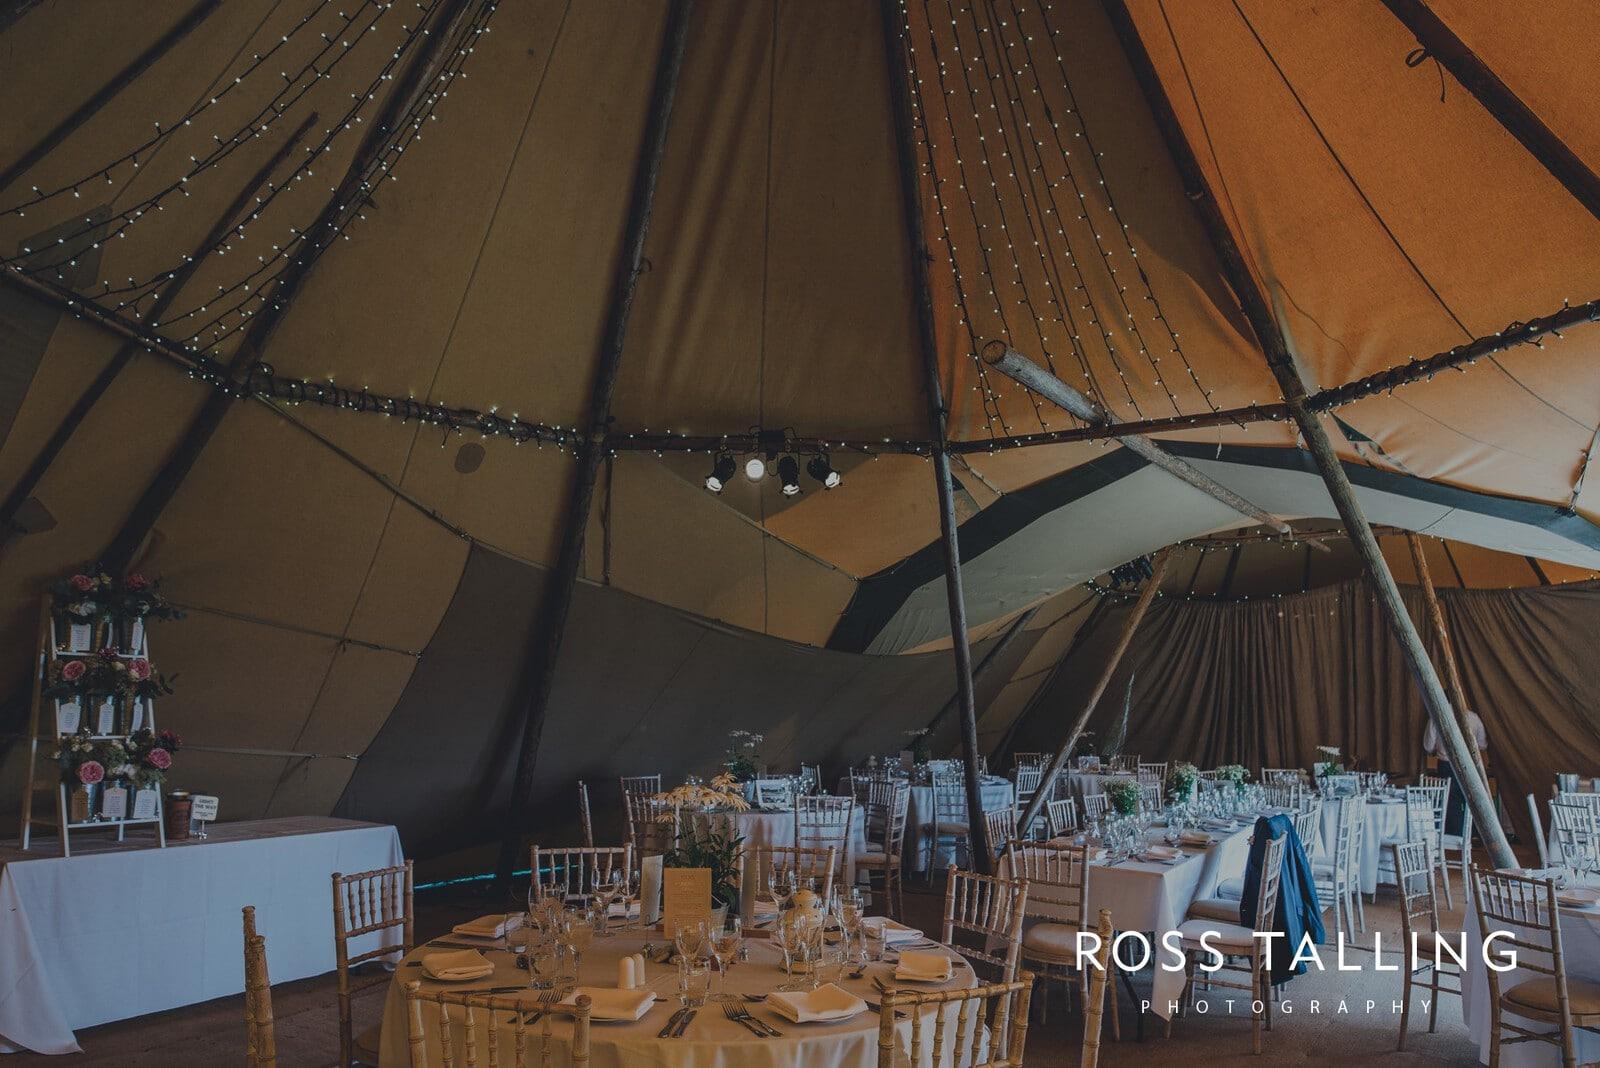 laura-matts-rosevine-hotel-wedding-photography-cornwall_0108